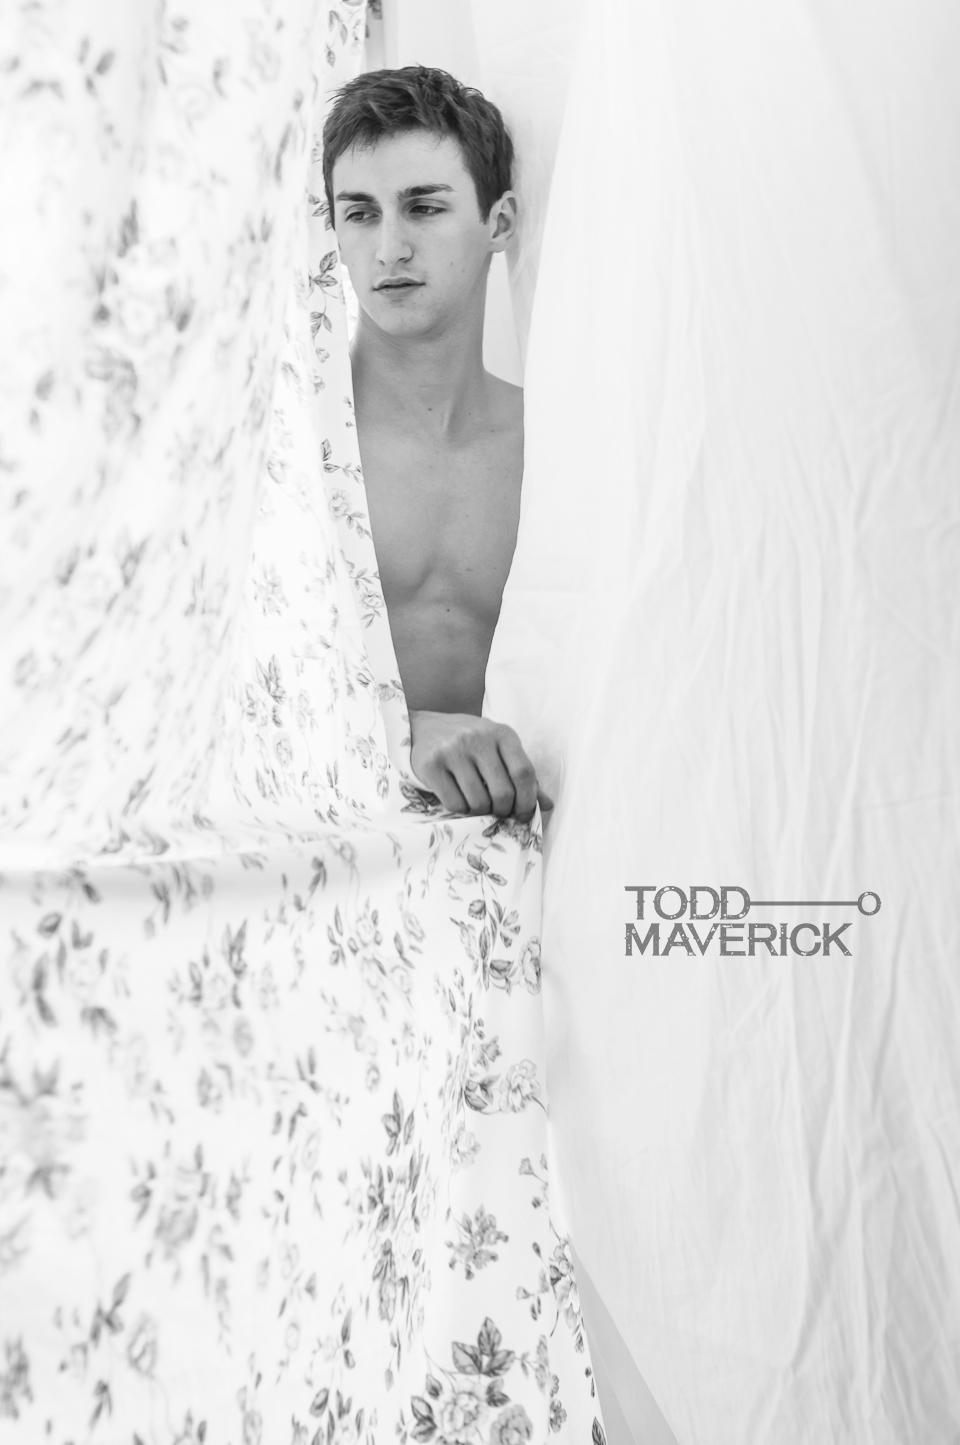 toddmaverick_cary_sheets_W-11.jpg